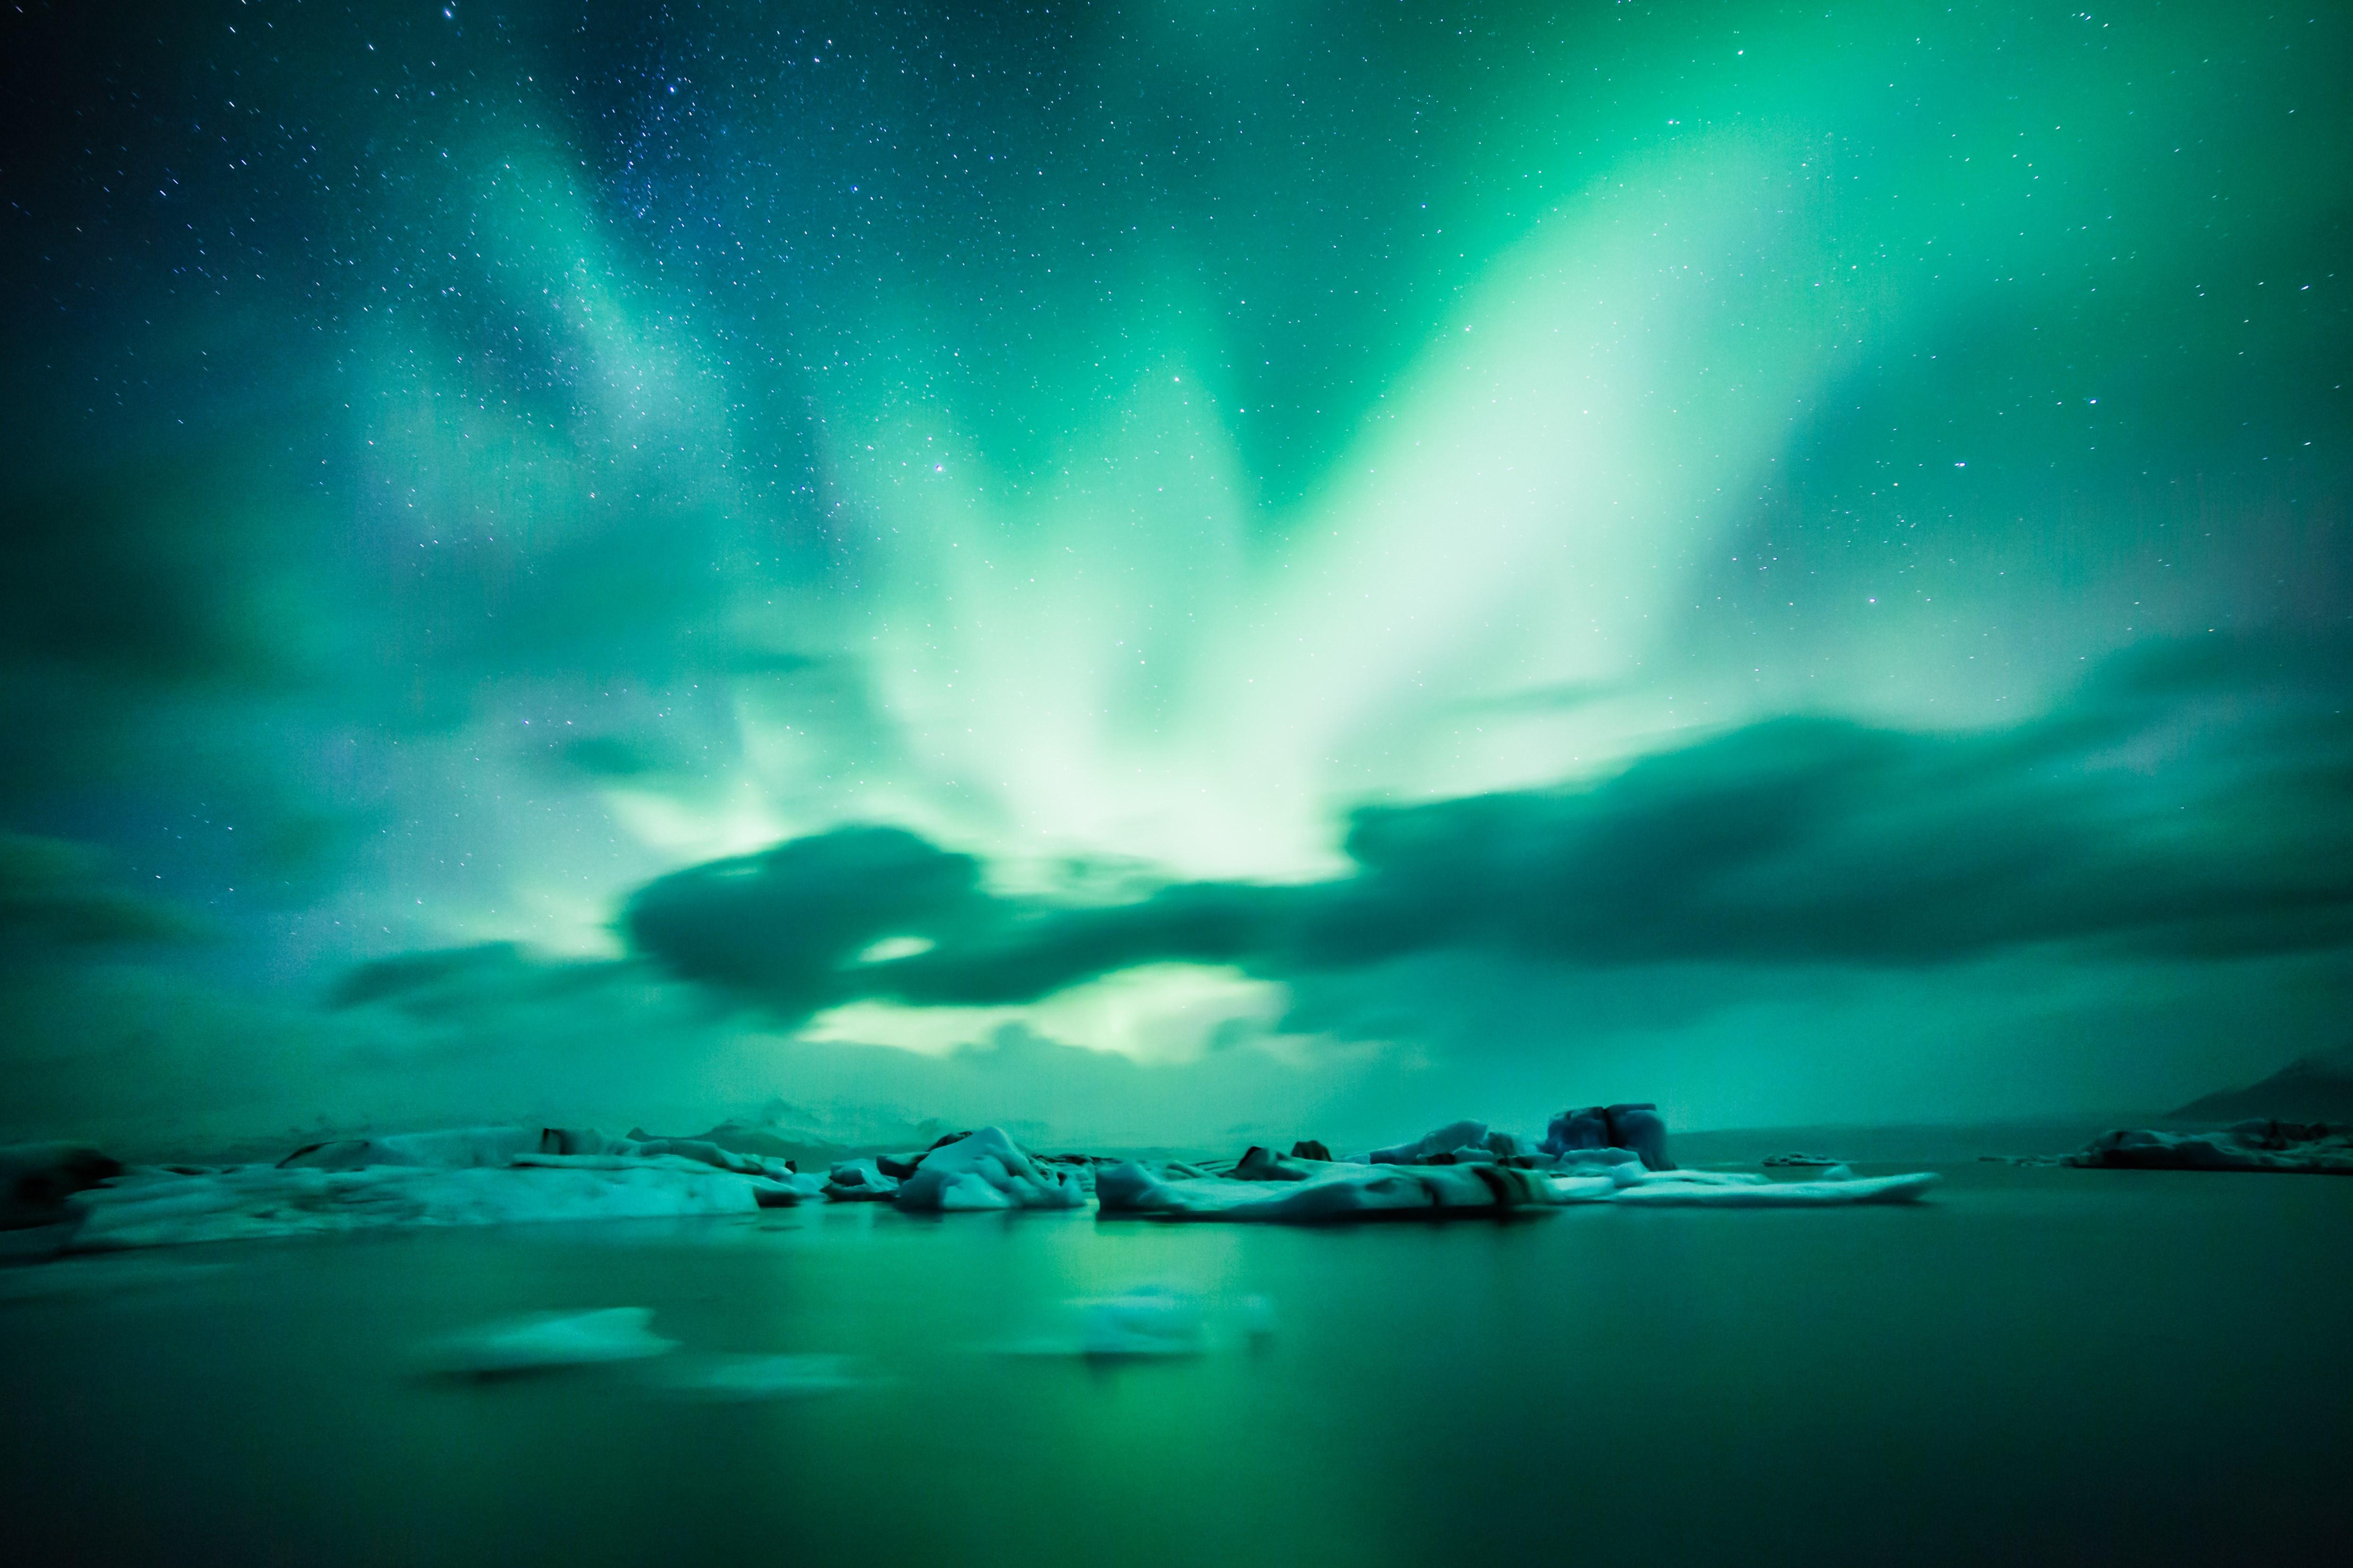 56679 Заставки и Обои Лед на телефон. Скачать Лед, Природа, Горизонт, Озеро, Северное Сияние, Аврора, Исландия картинки бесплатно